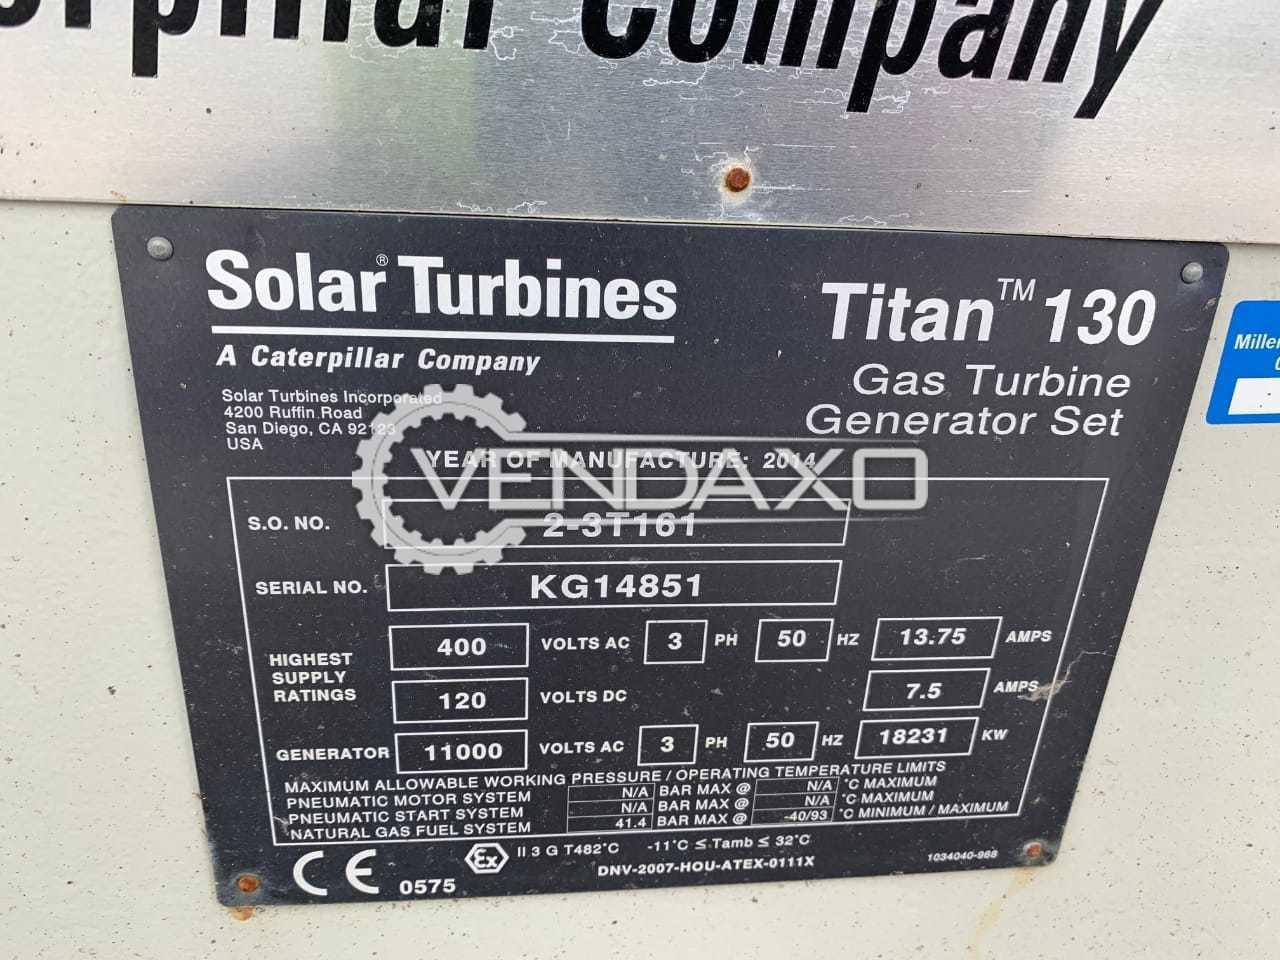 Caterpillar Titan 130 Solar Gas Turbine Generator - 17 MW